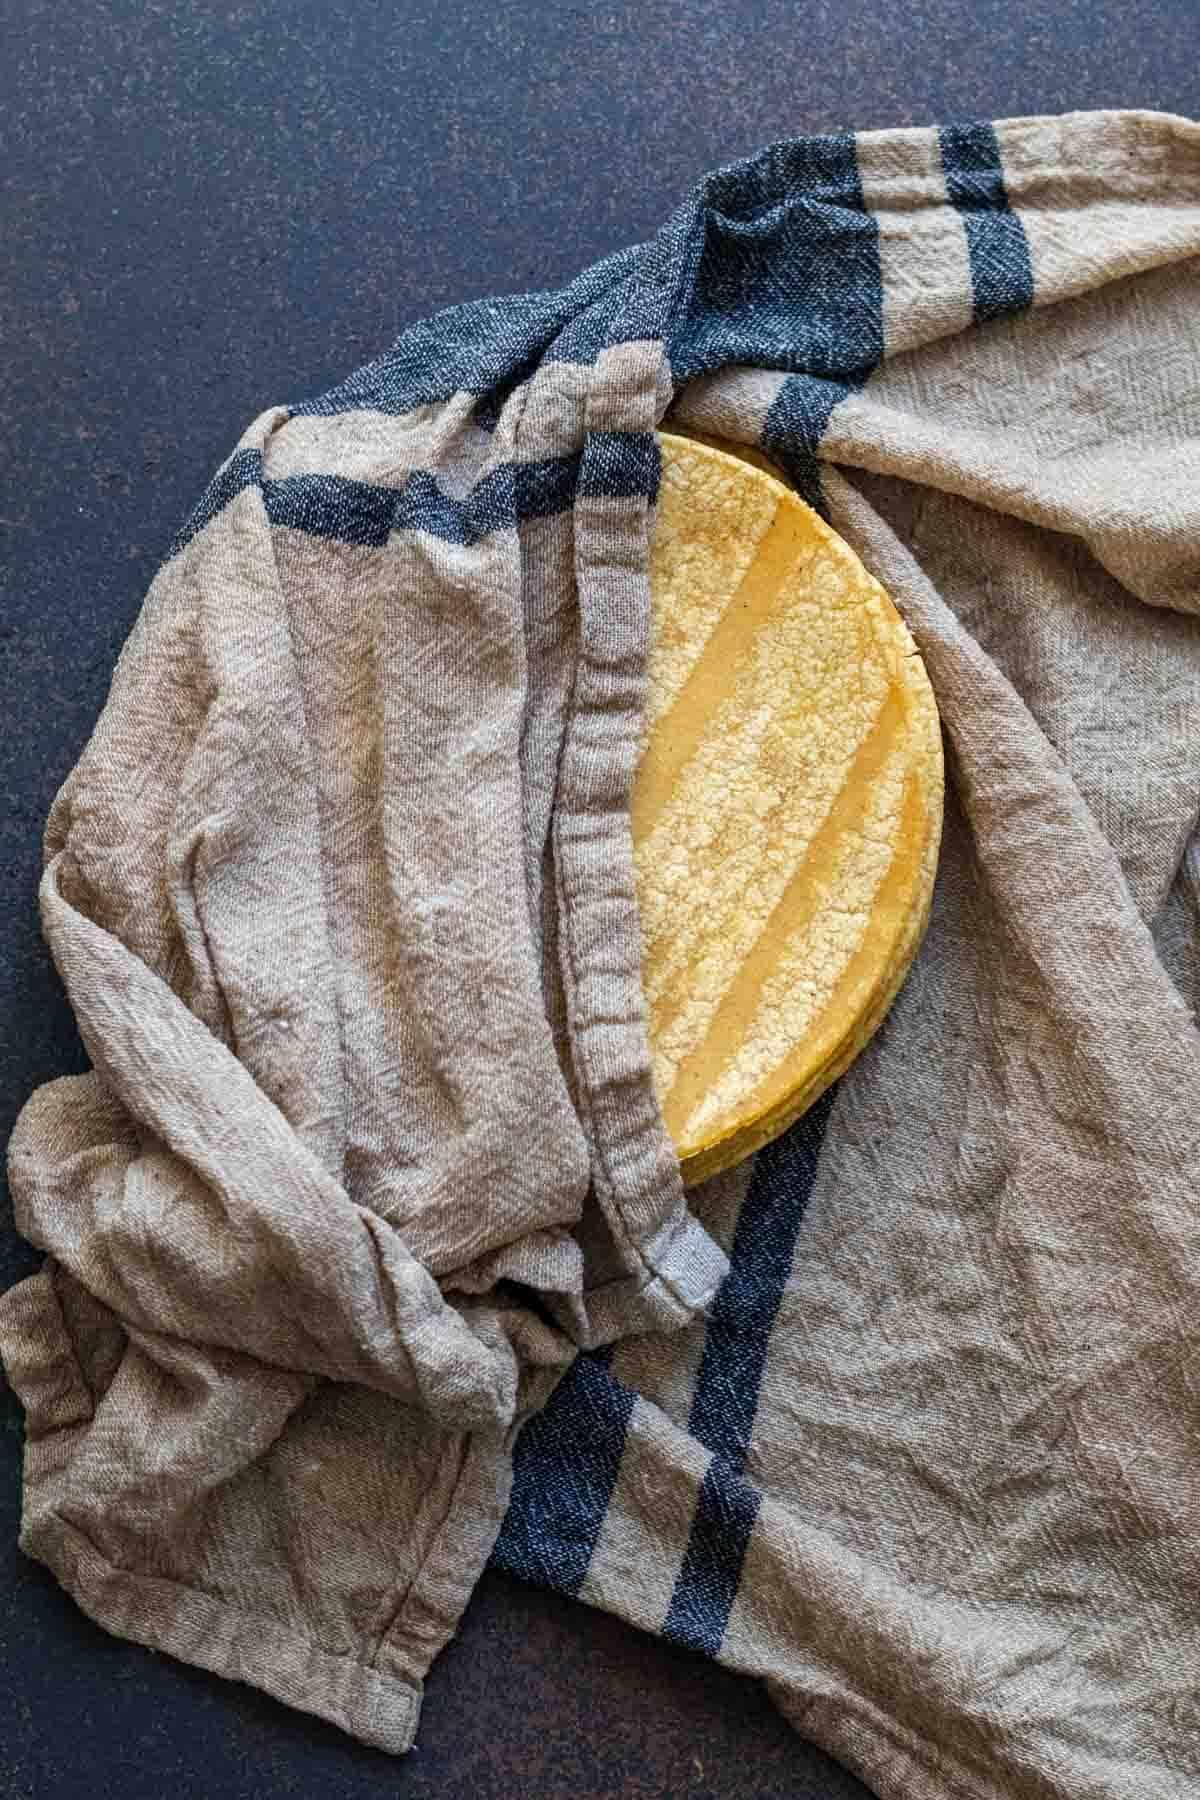 Stack of corn tortillas wrapped in damp tea towel.